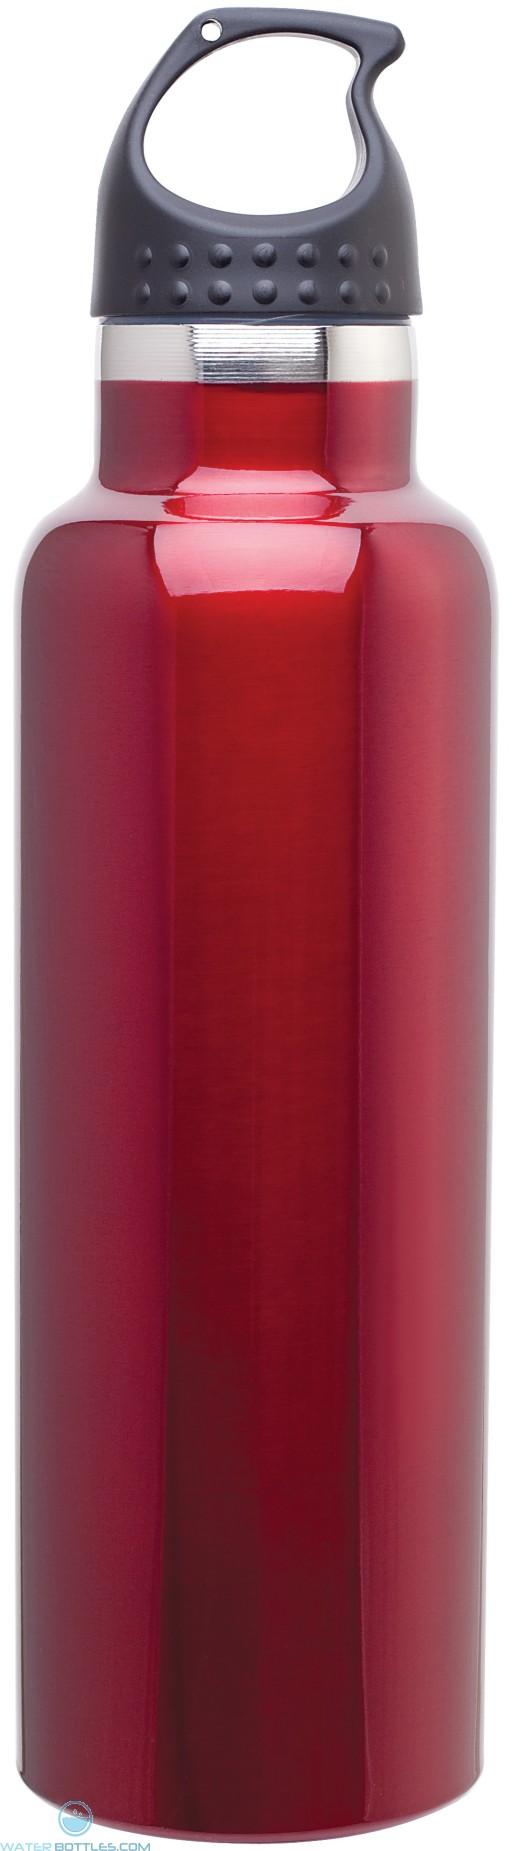 H2go Volt Vacuum SS Bottles | 20 oz - Red